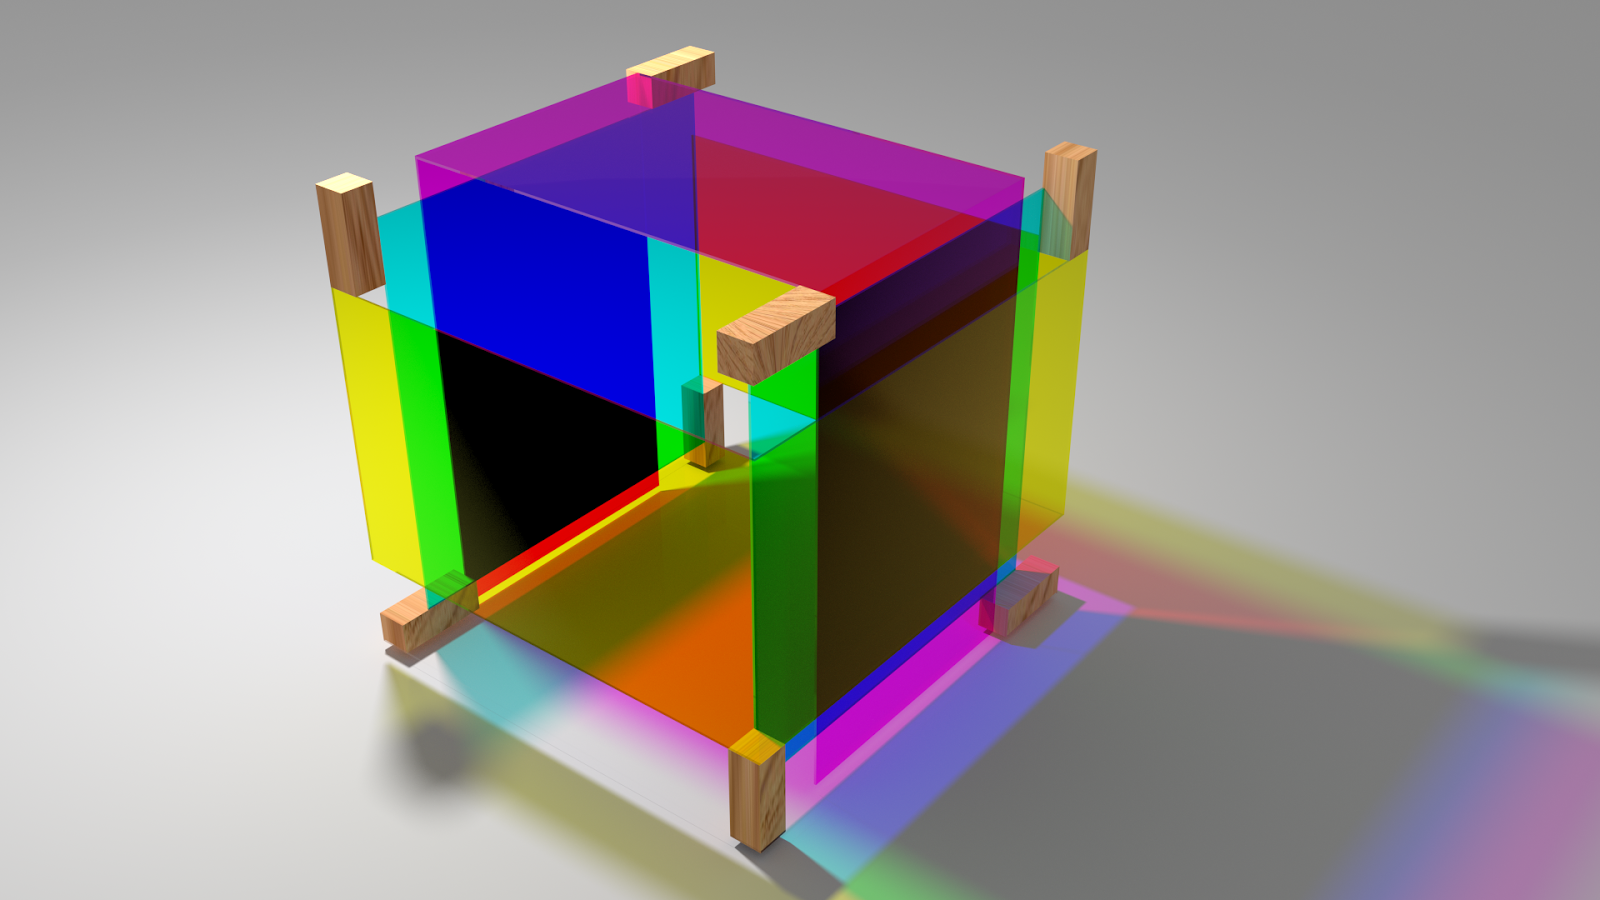 Parabolic Dimensions Studio: Die subtraktive Würfel - Studentenprojekt